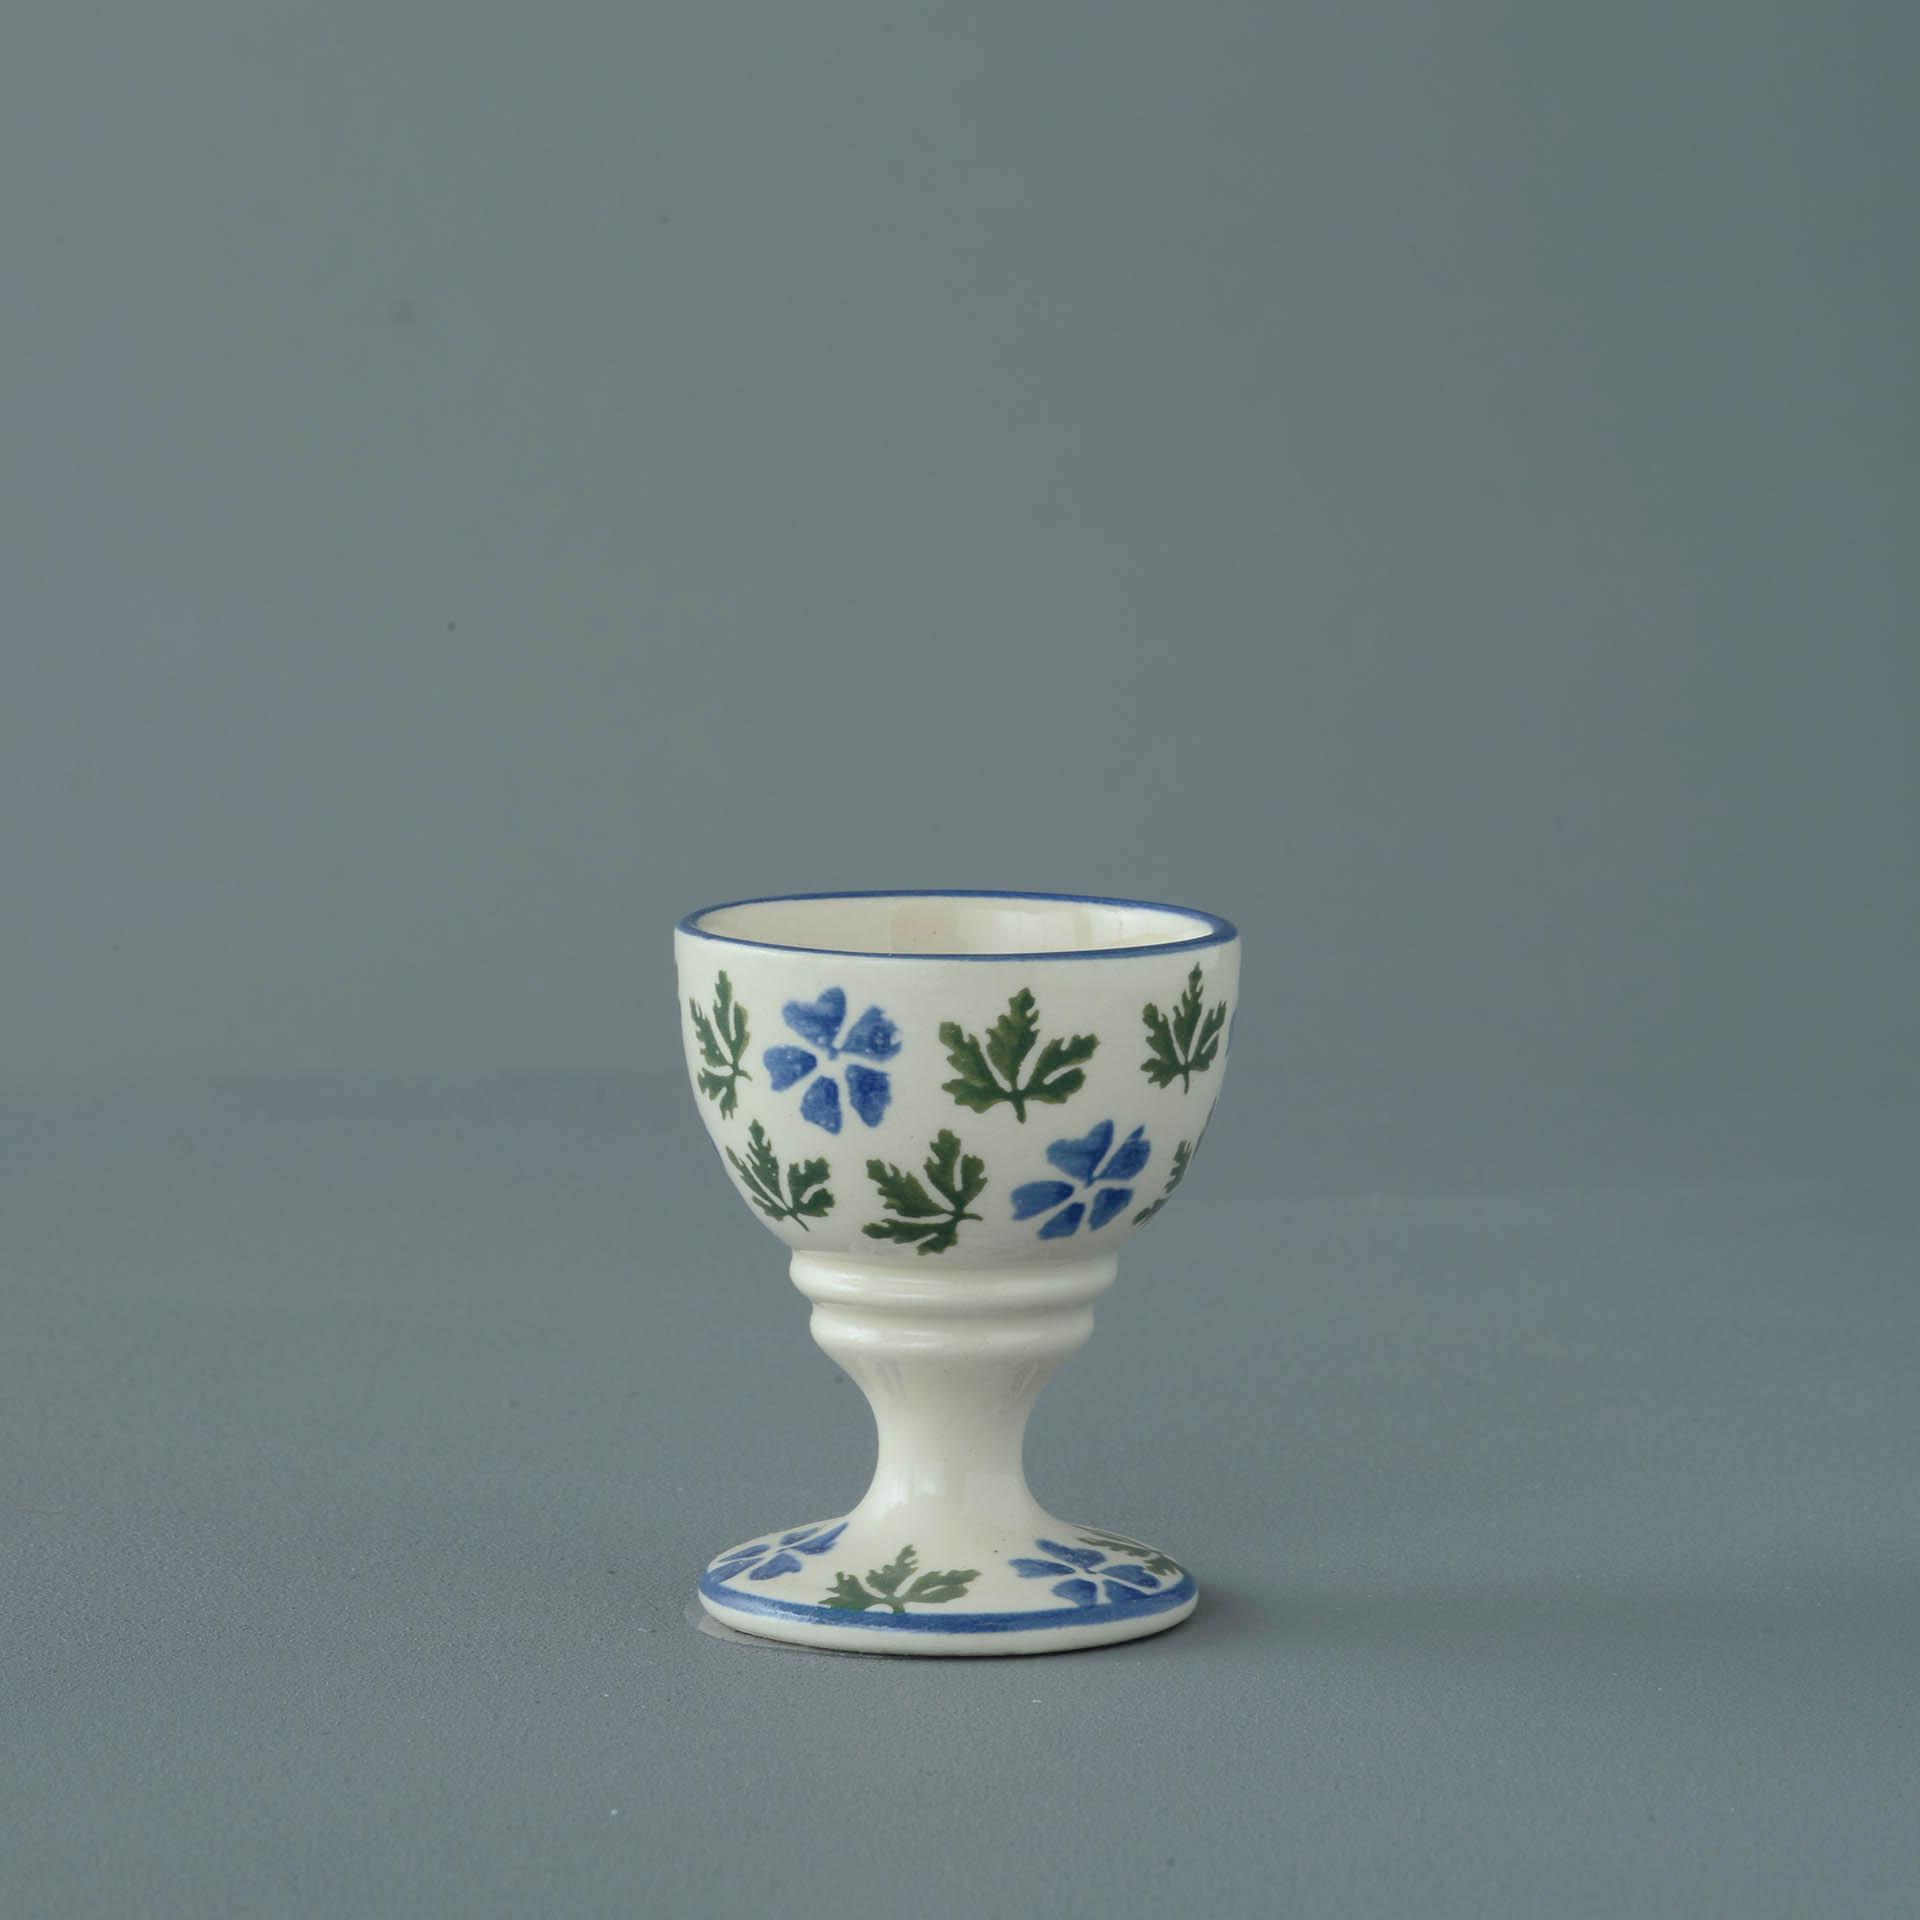 Geranium Egg cup 6.3 x 5.2cm